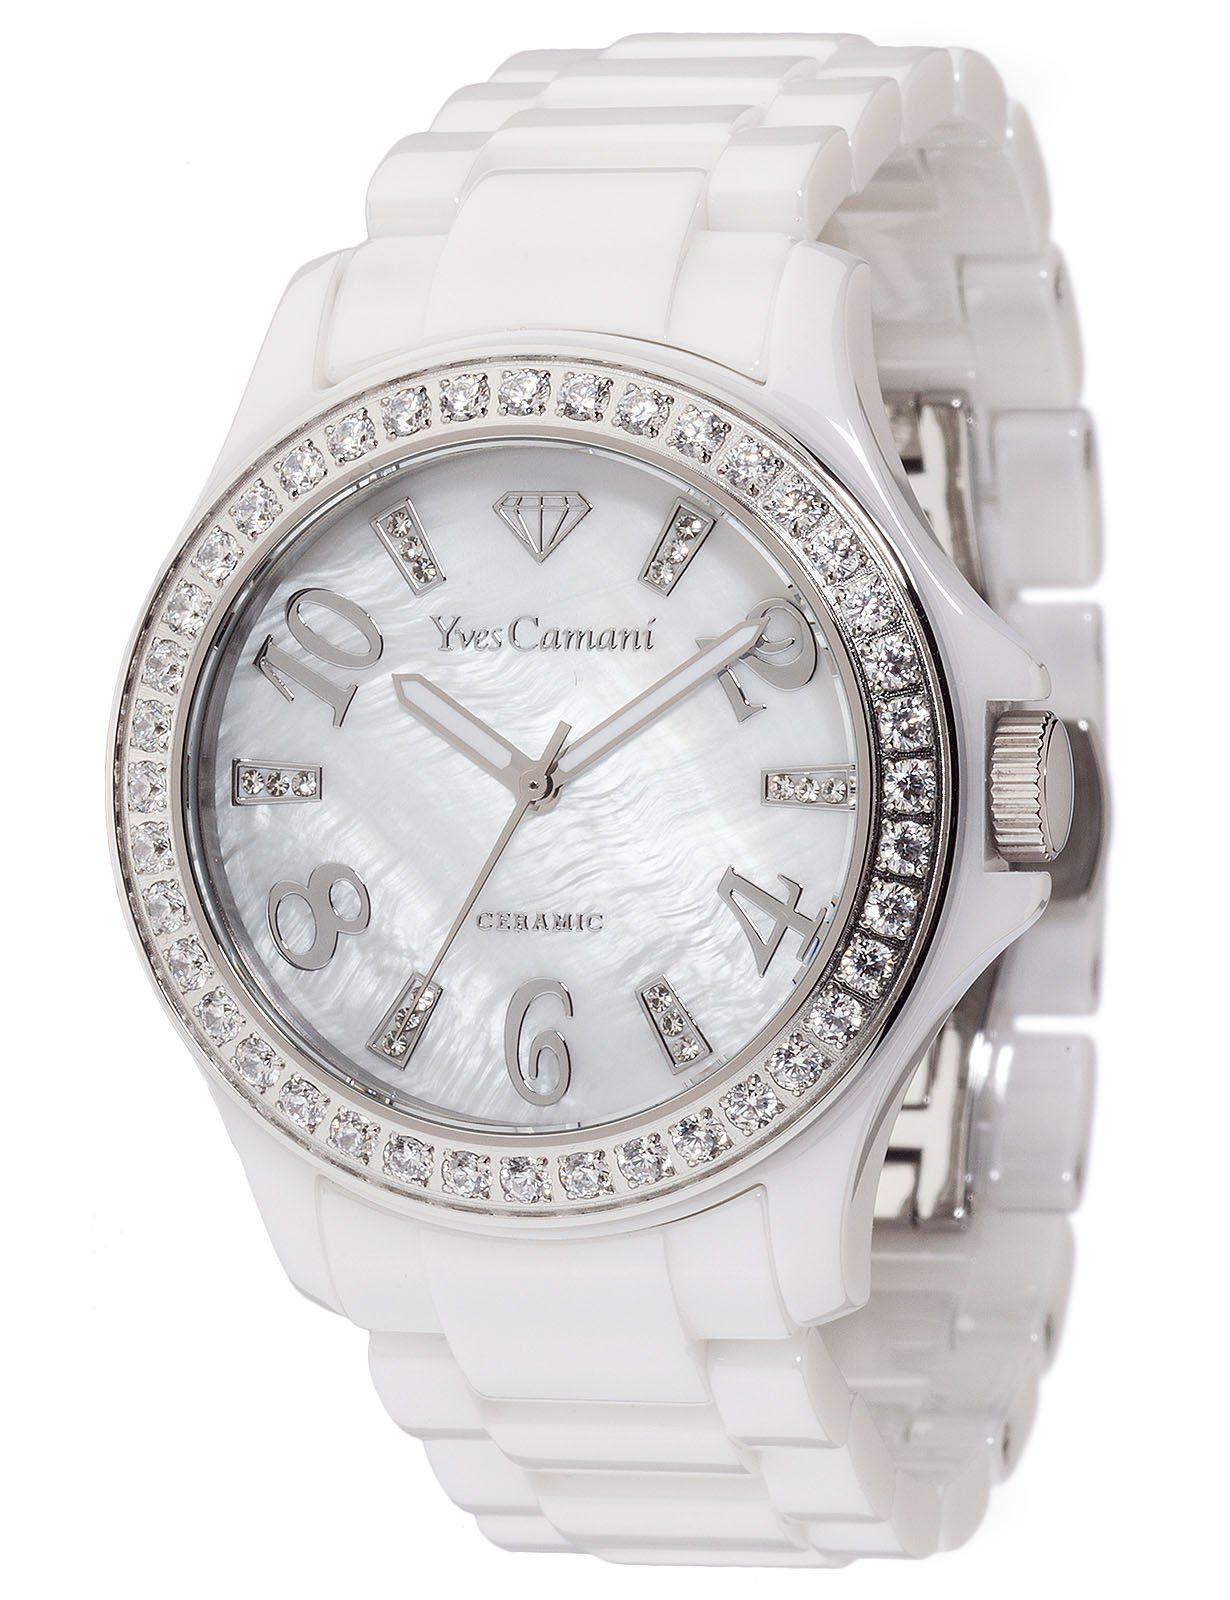 Robot Check Womens Watches Watches Wrist Watch